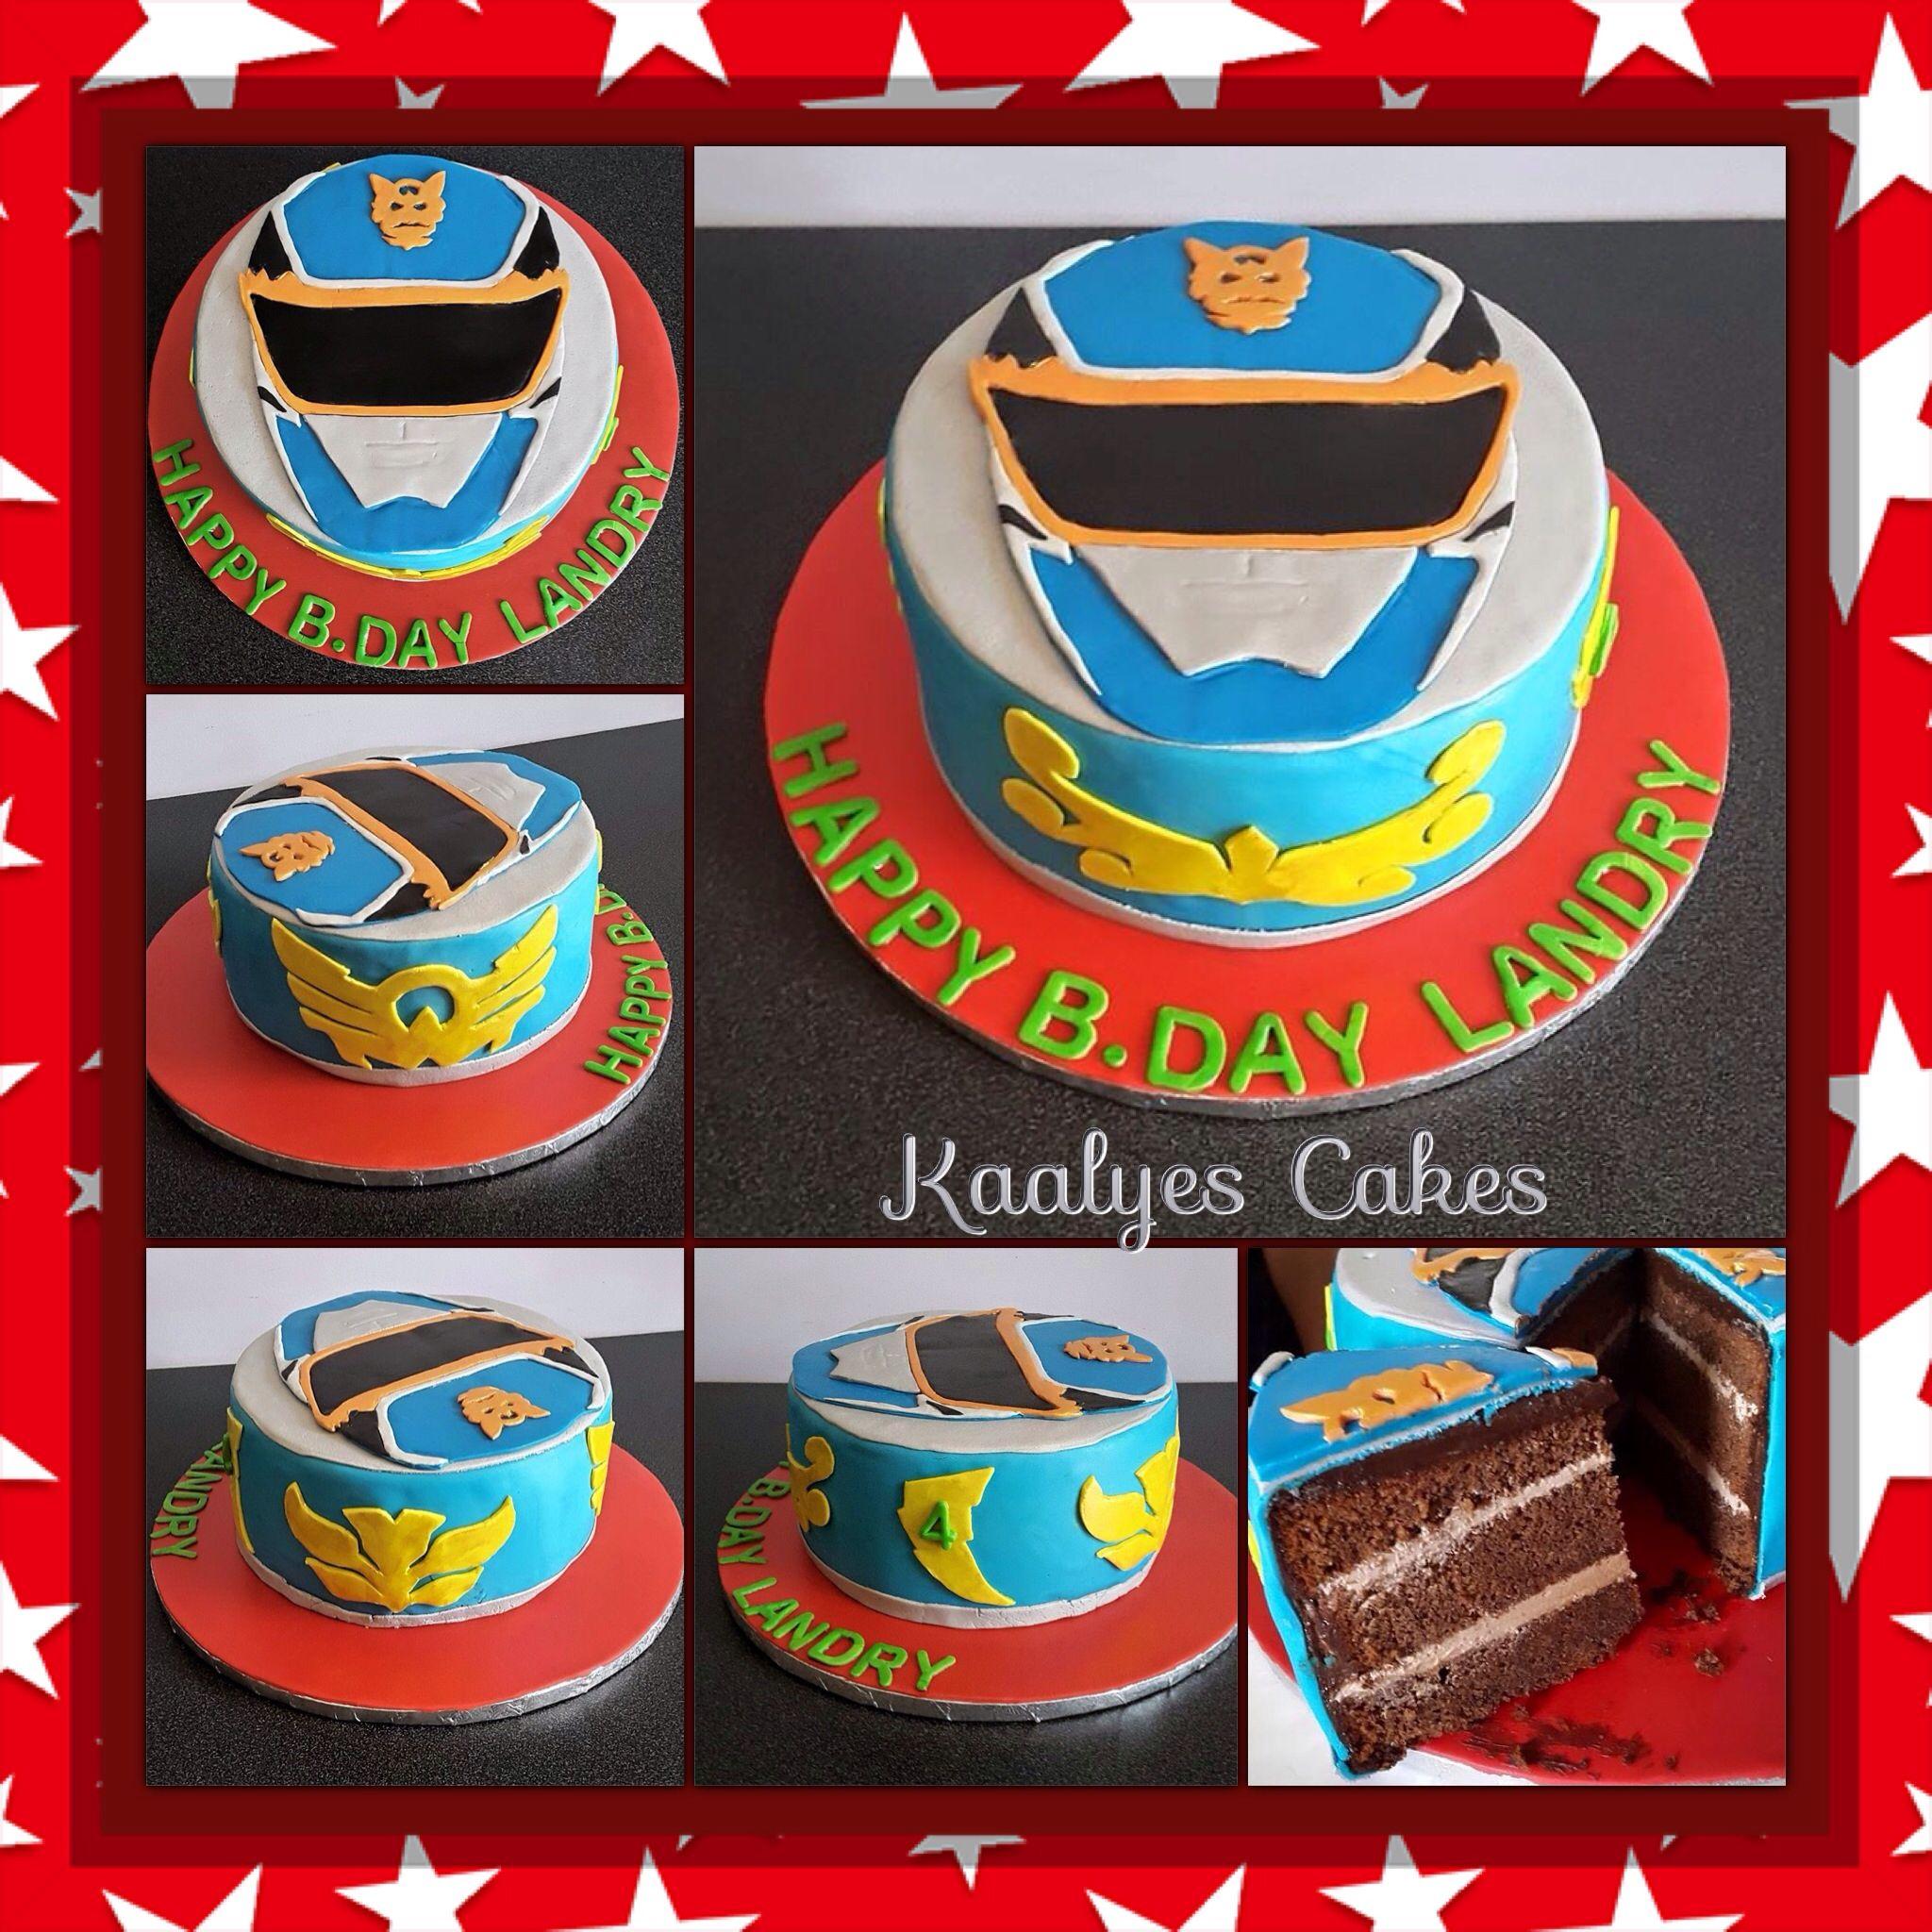 Marvelous Power Ranger Megaforce Cake With Images Power Ranger Cake Funny Birthday Cards Online Inifodamsfinfo